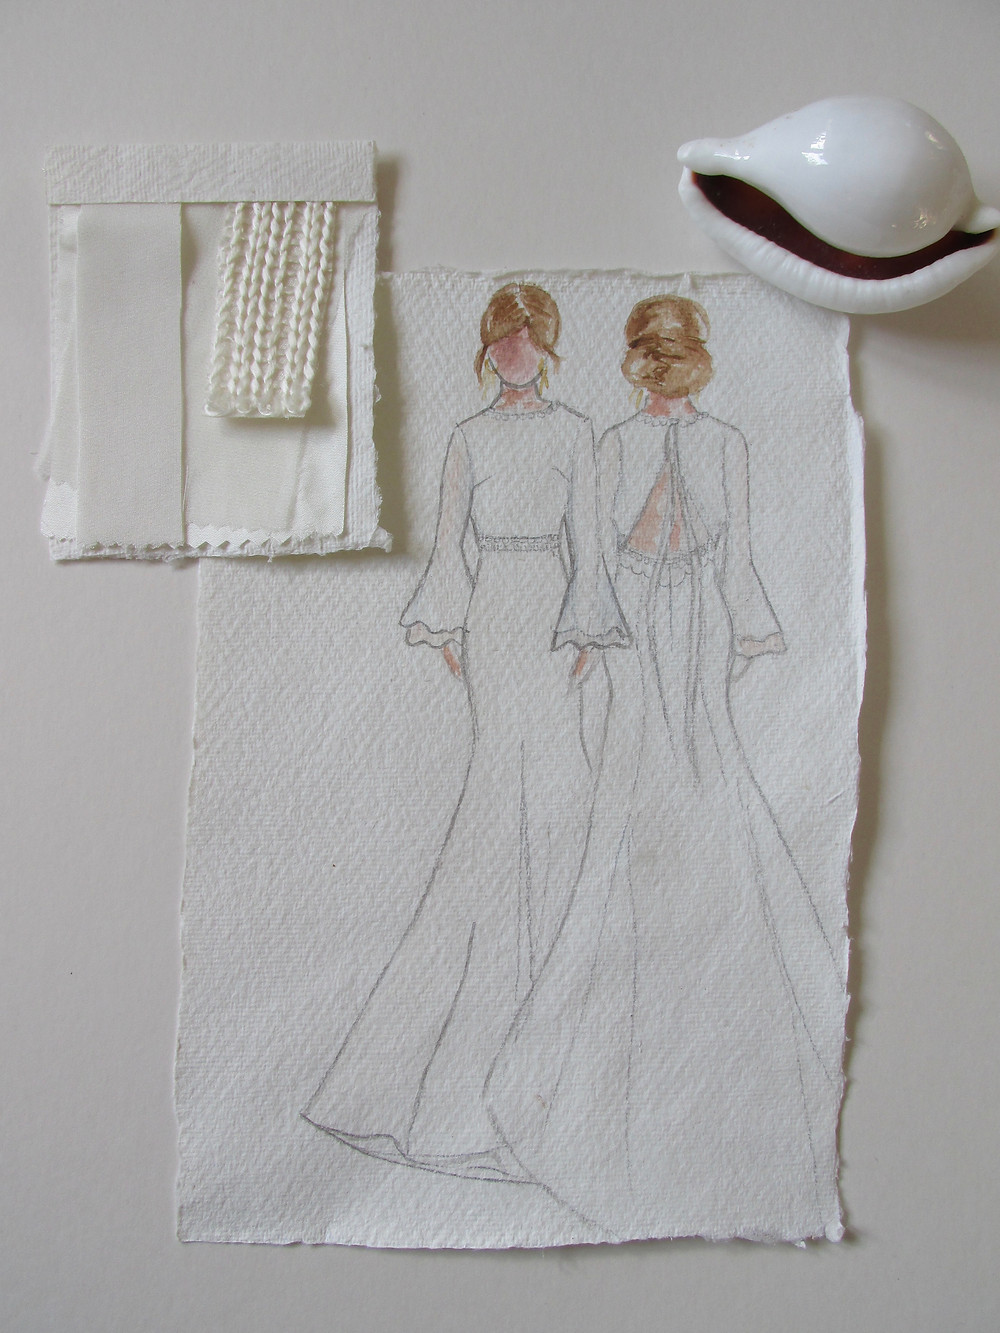 'Royal' wedding dress Jessica Turner Designs, modern sleek wedding dress with boho sleeves. A subtle boho wedding dress with a stunning low back